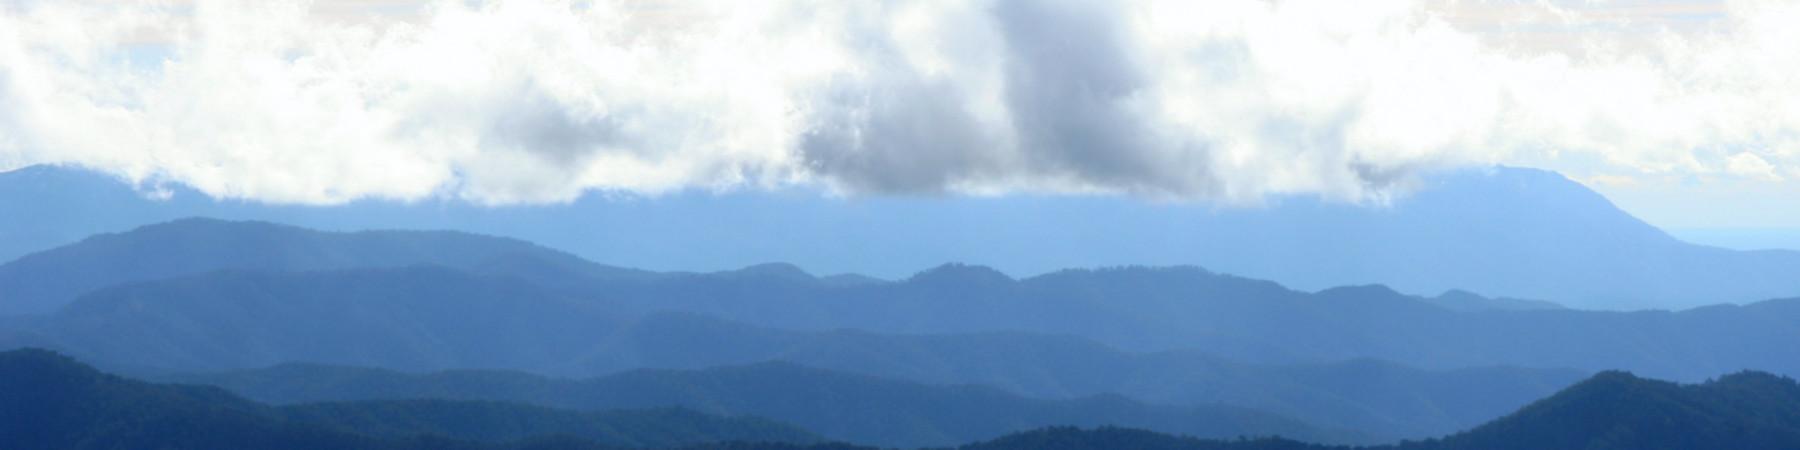 Blue Mountains Wikitravel